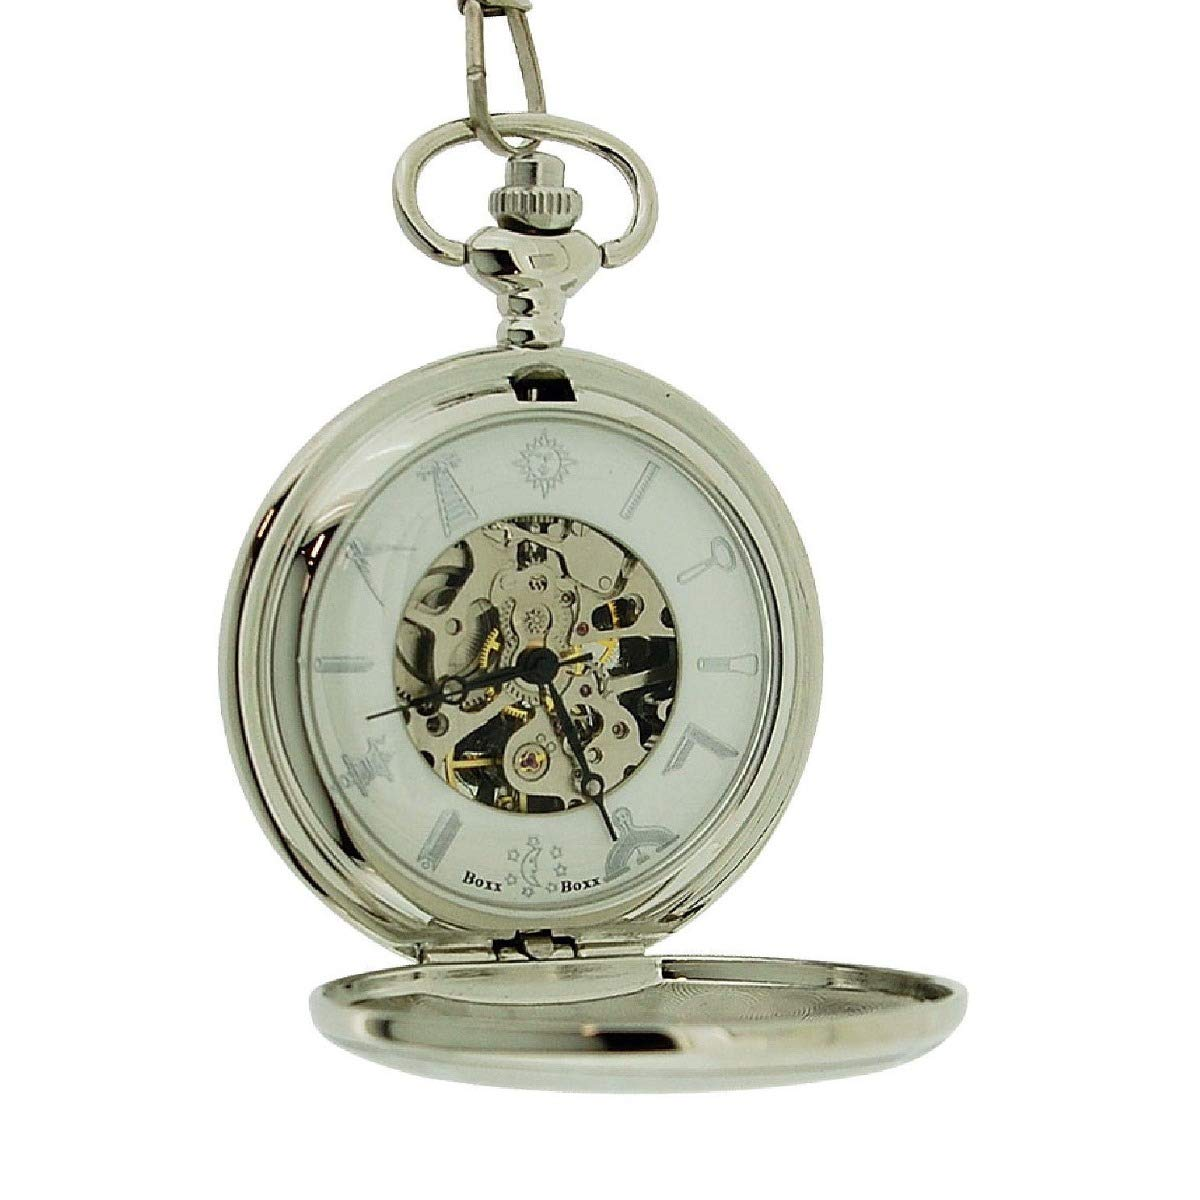 b7a1c9145 Boxx Gents Silver Tone Masonic Mechanical Pocket Watch on 13 Inch Chain  BOXX354: Amazon.co.uk: Watches